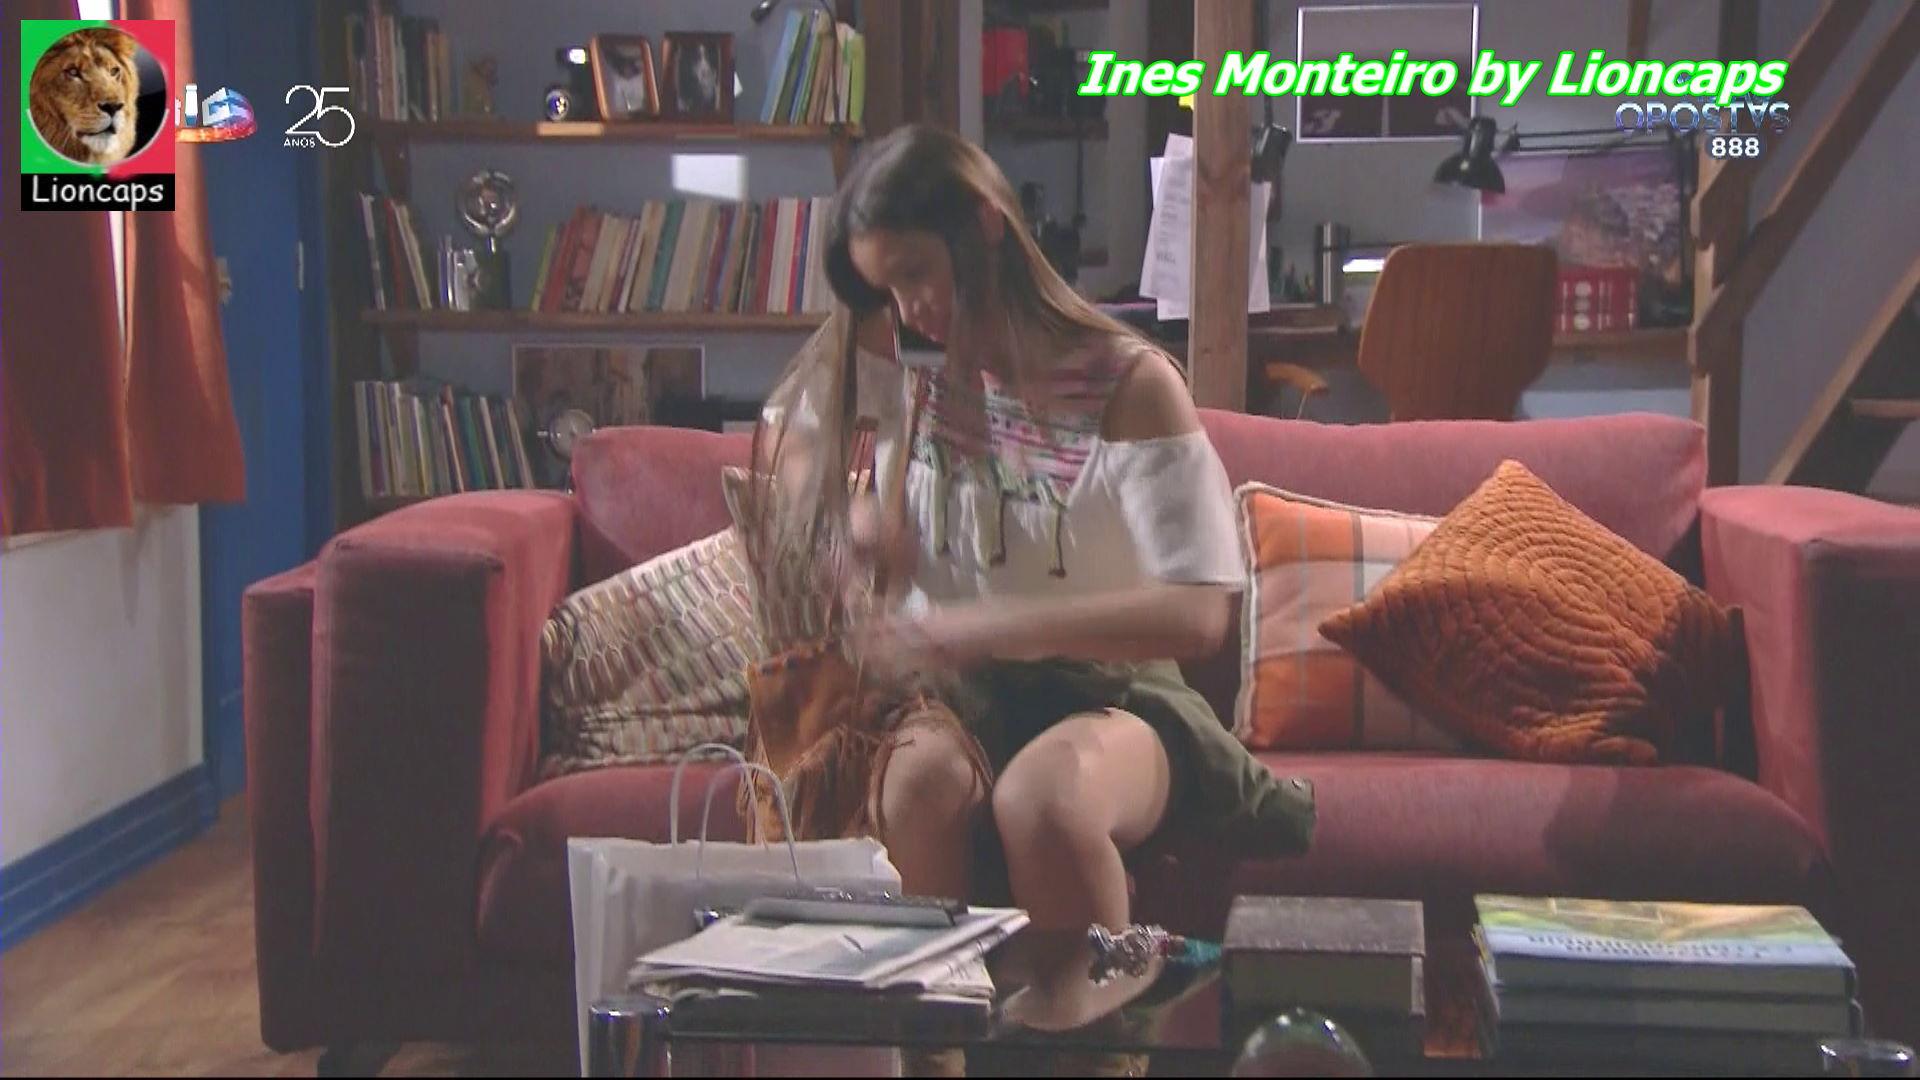 454307972_ines_monteiro_vs181111_0271_122_247lo.JPG